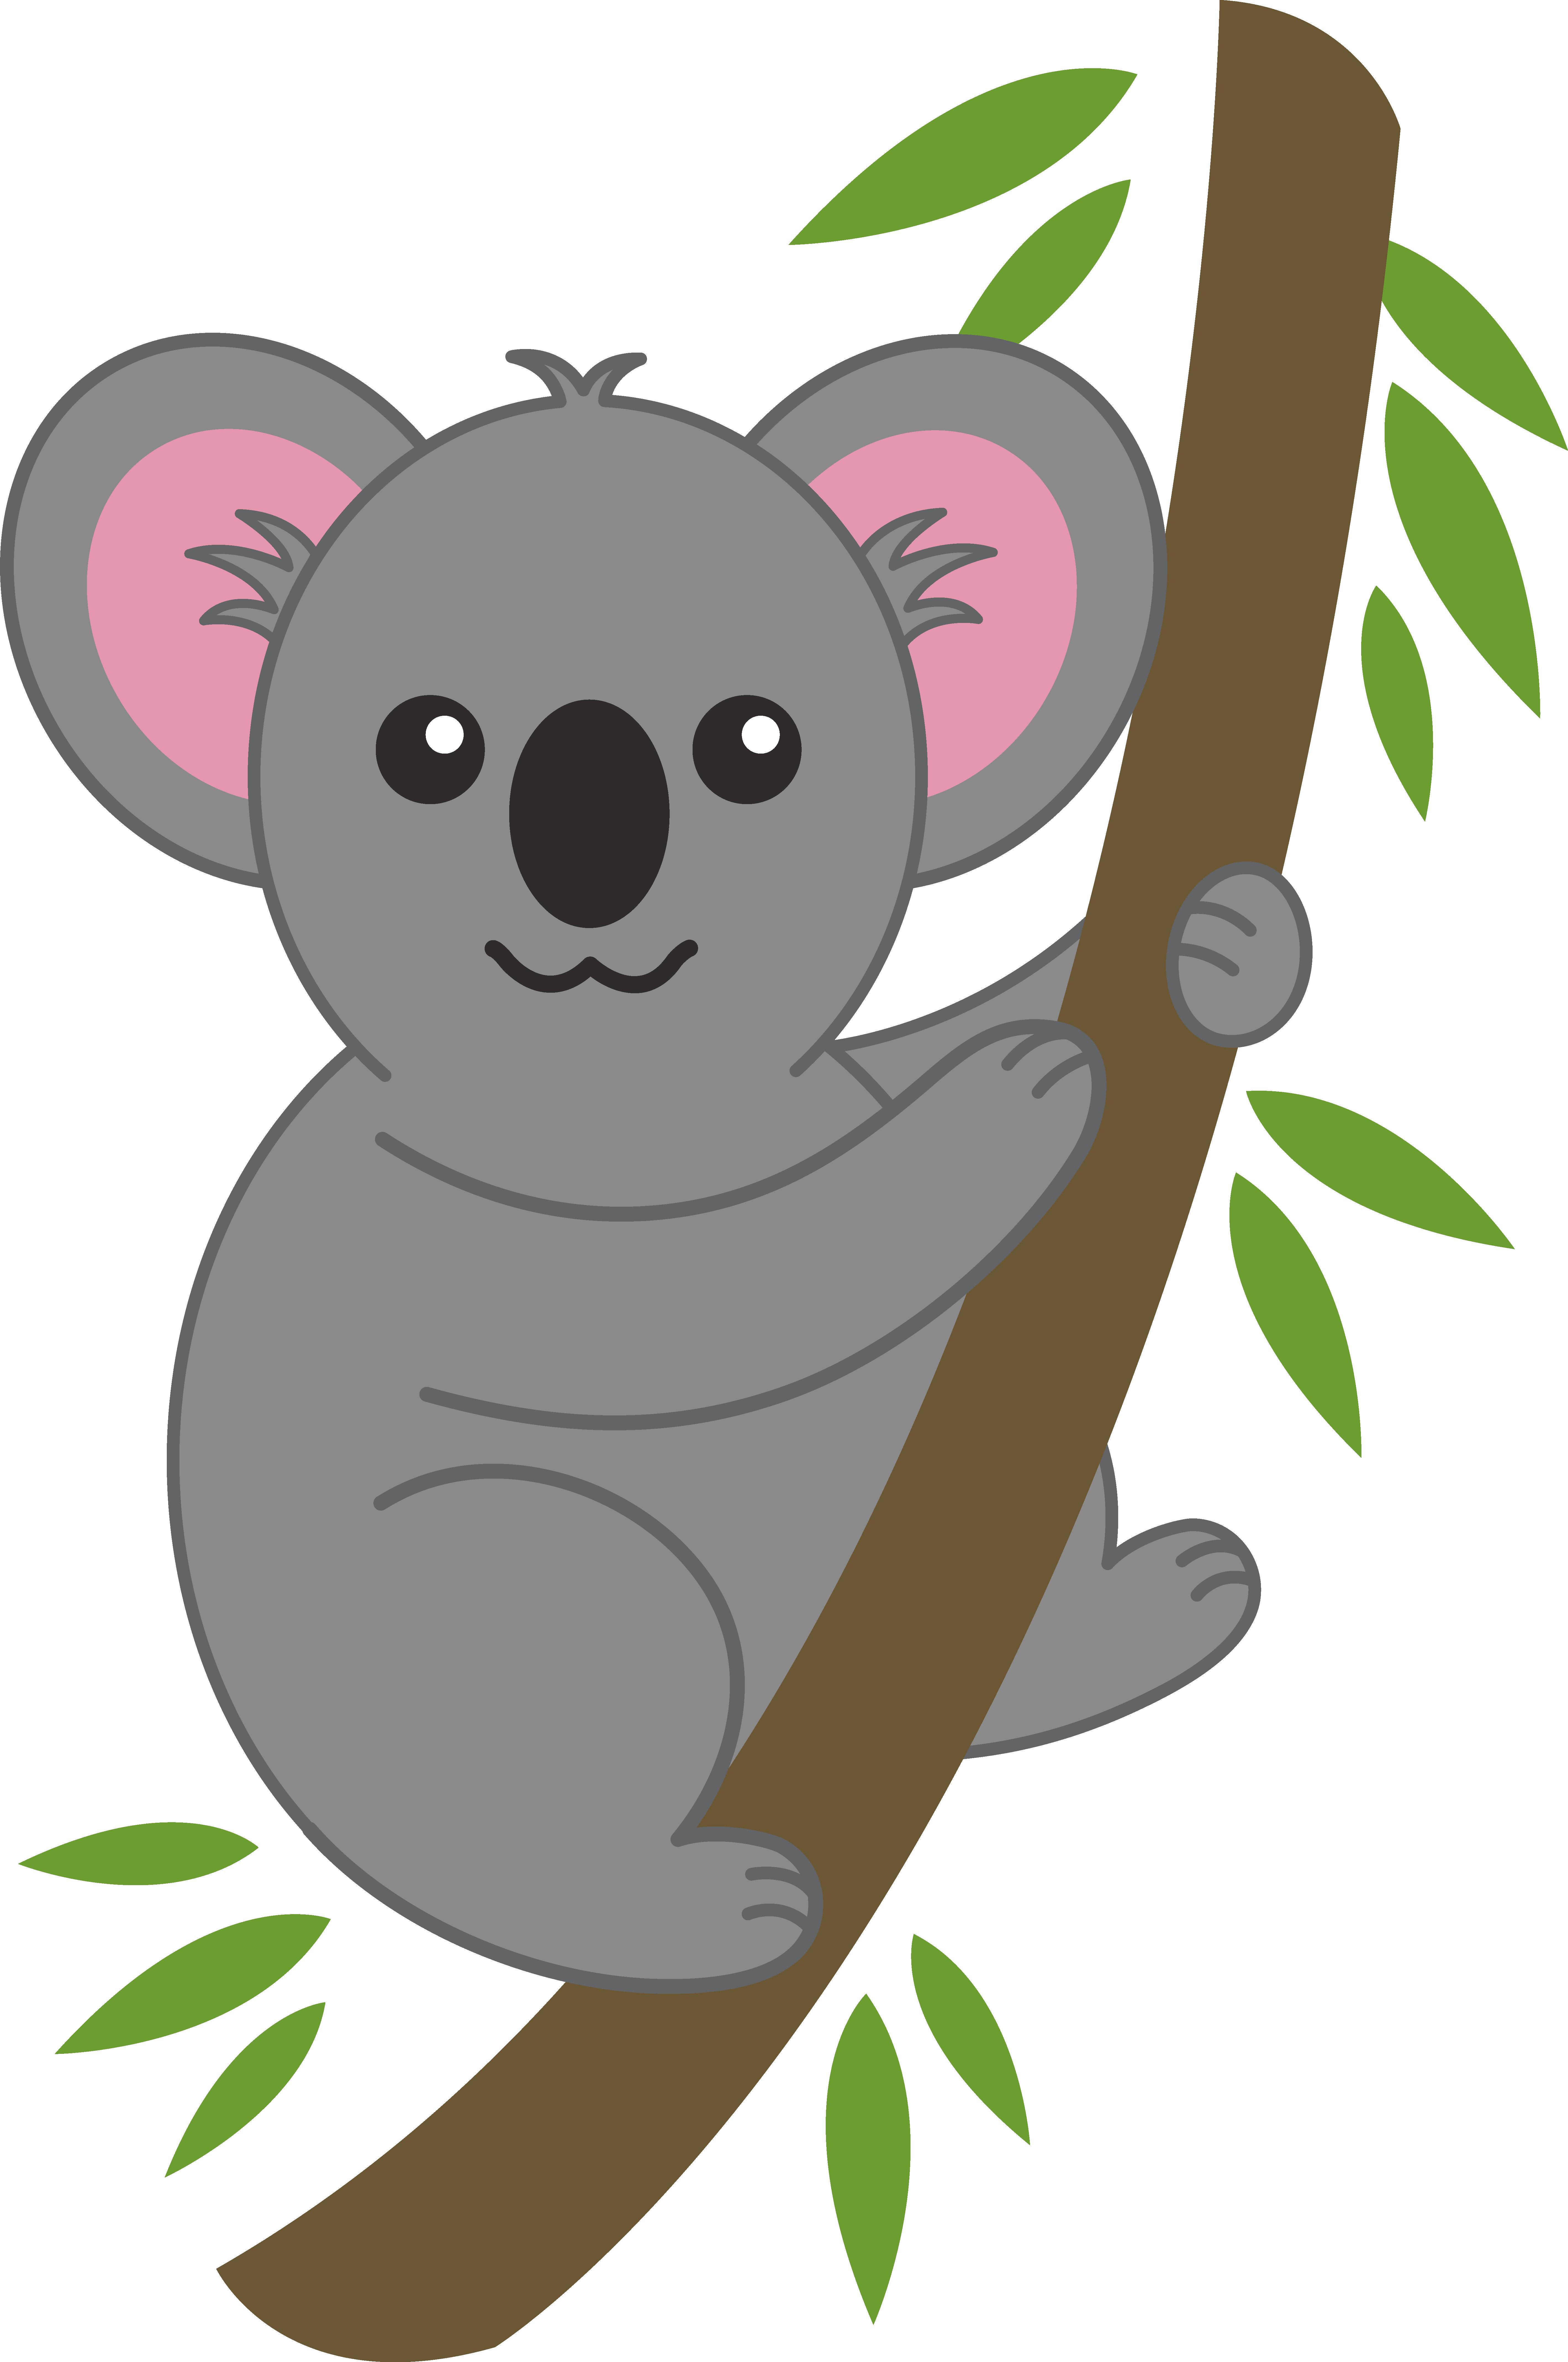 hight resolution of koala bear clip art cute koala on tree branch free clip art